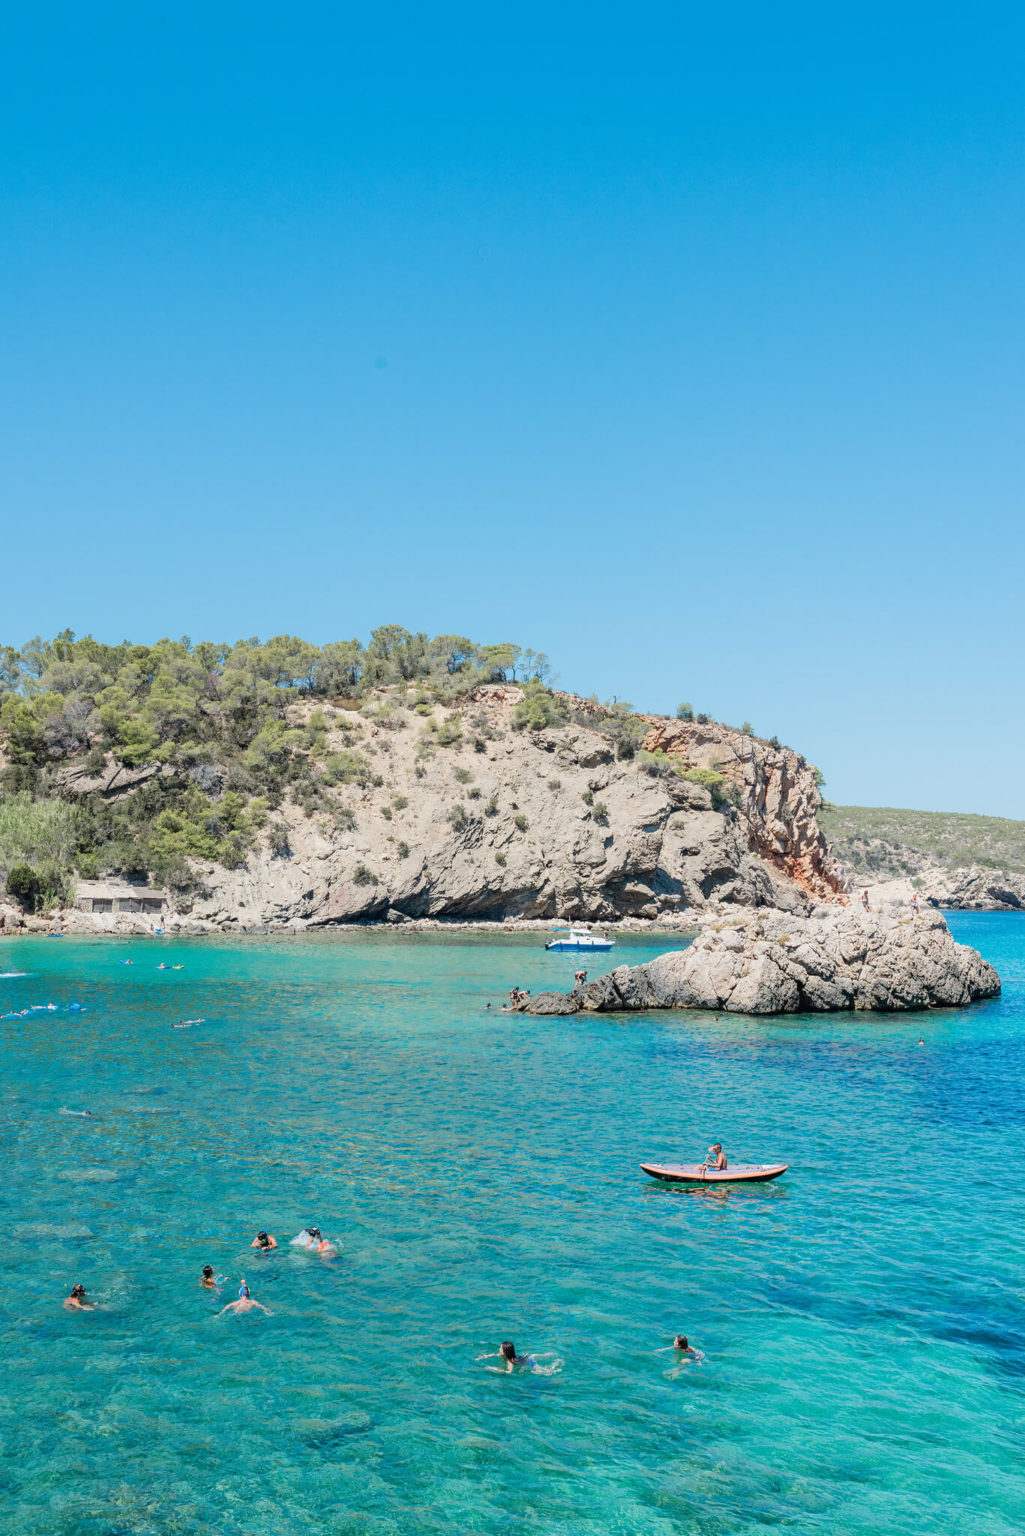 https://www.white-ibiza.com/wp-content/uploads/2020/03/ibiza-beaches-cala-xaracca-03-1025x1536.jpg